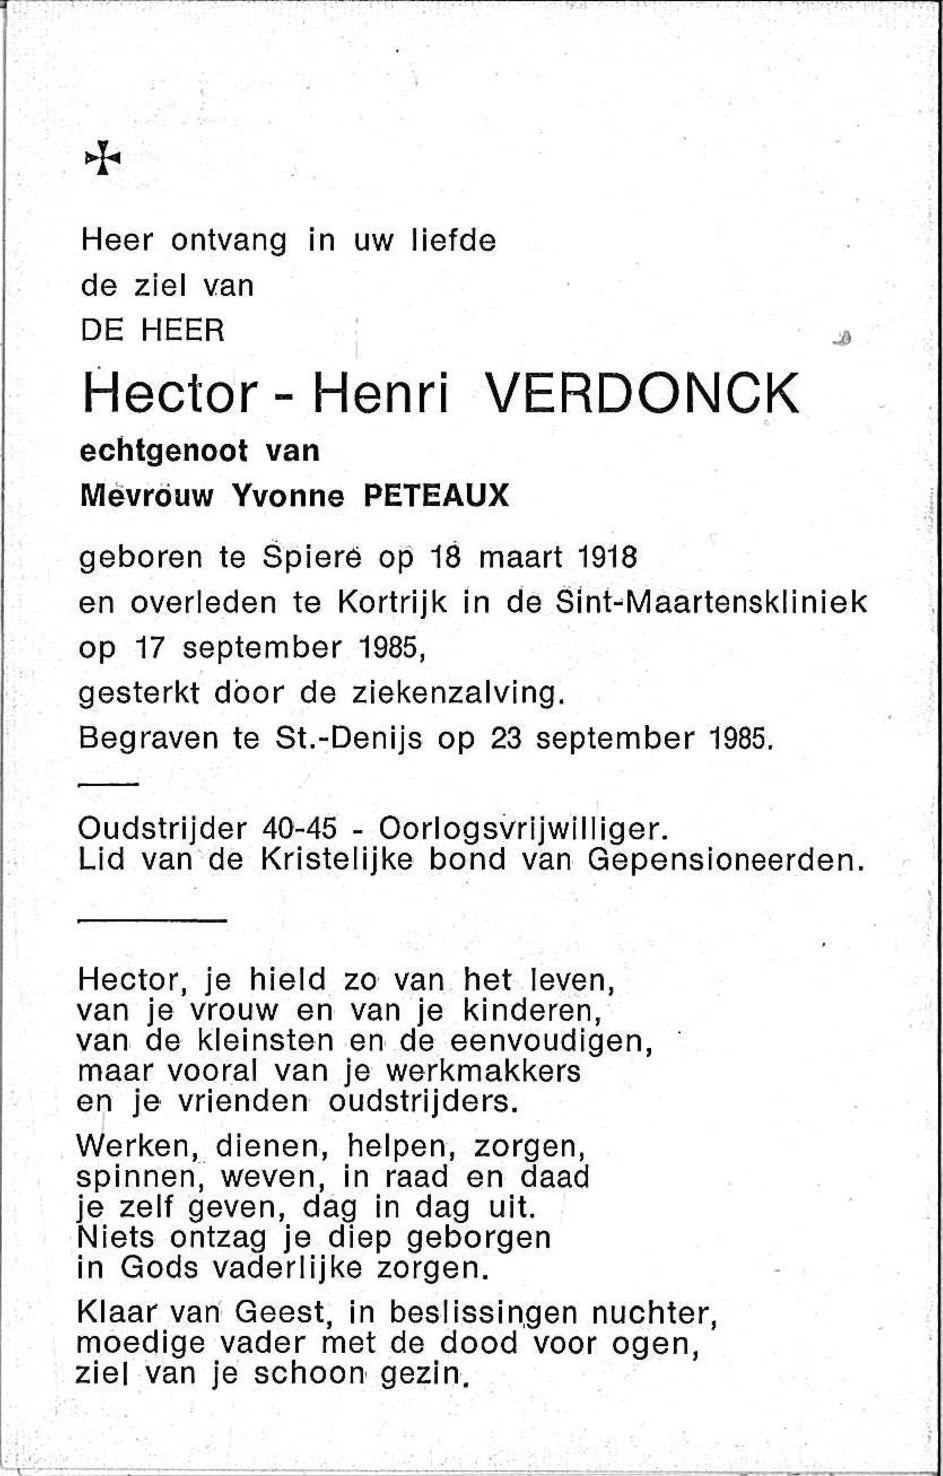 Verdonck Hector-Henri